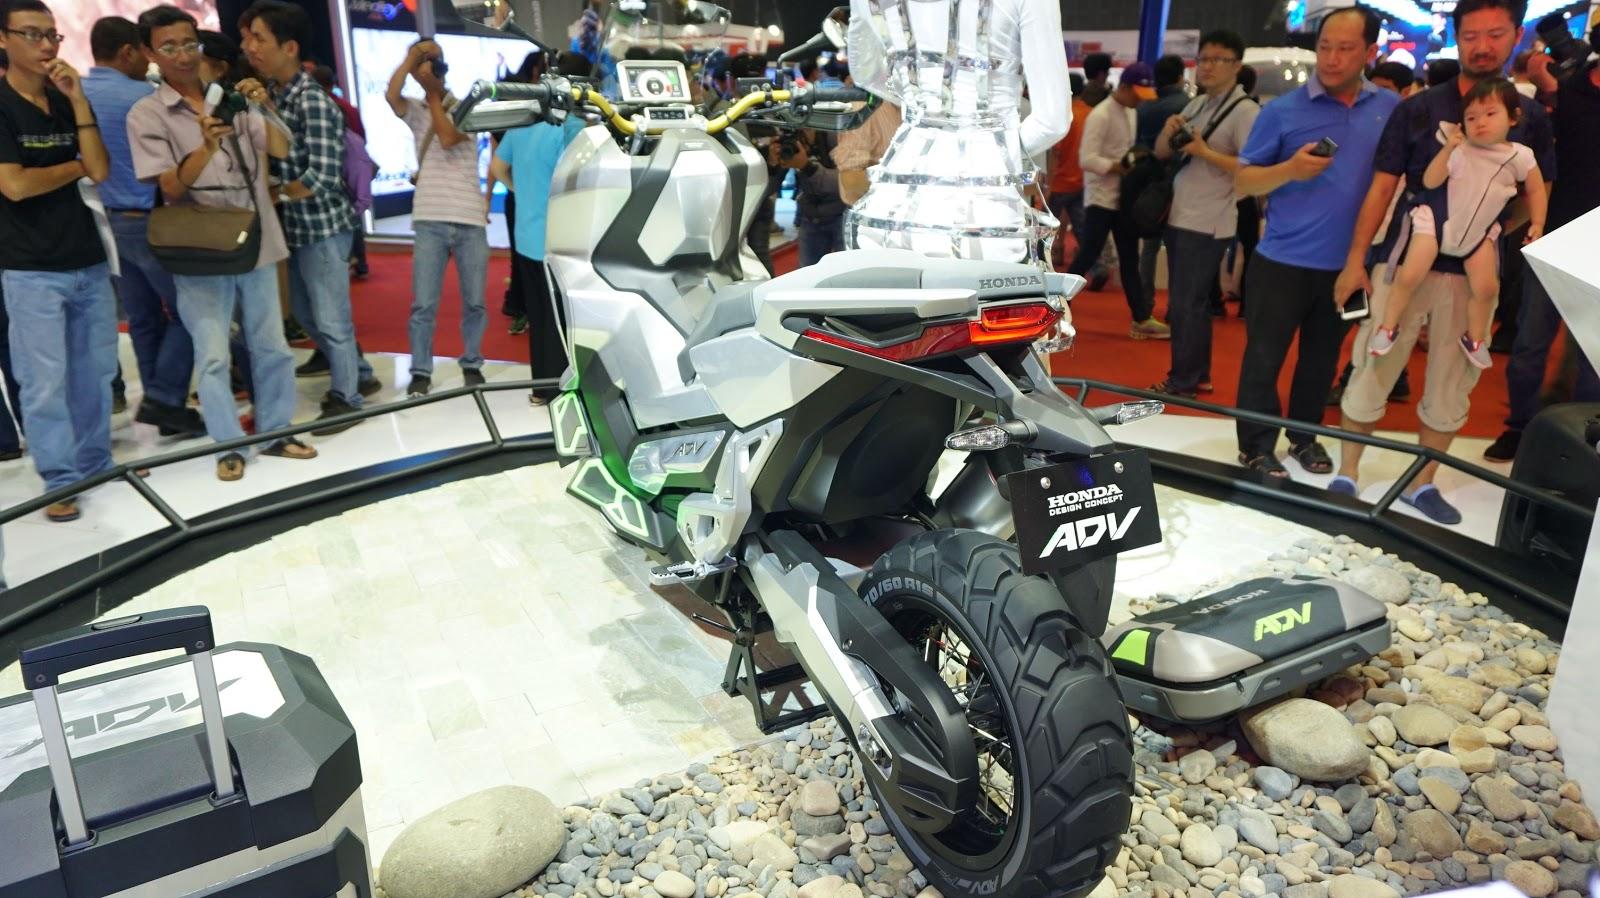 Honda ADV